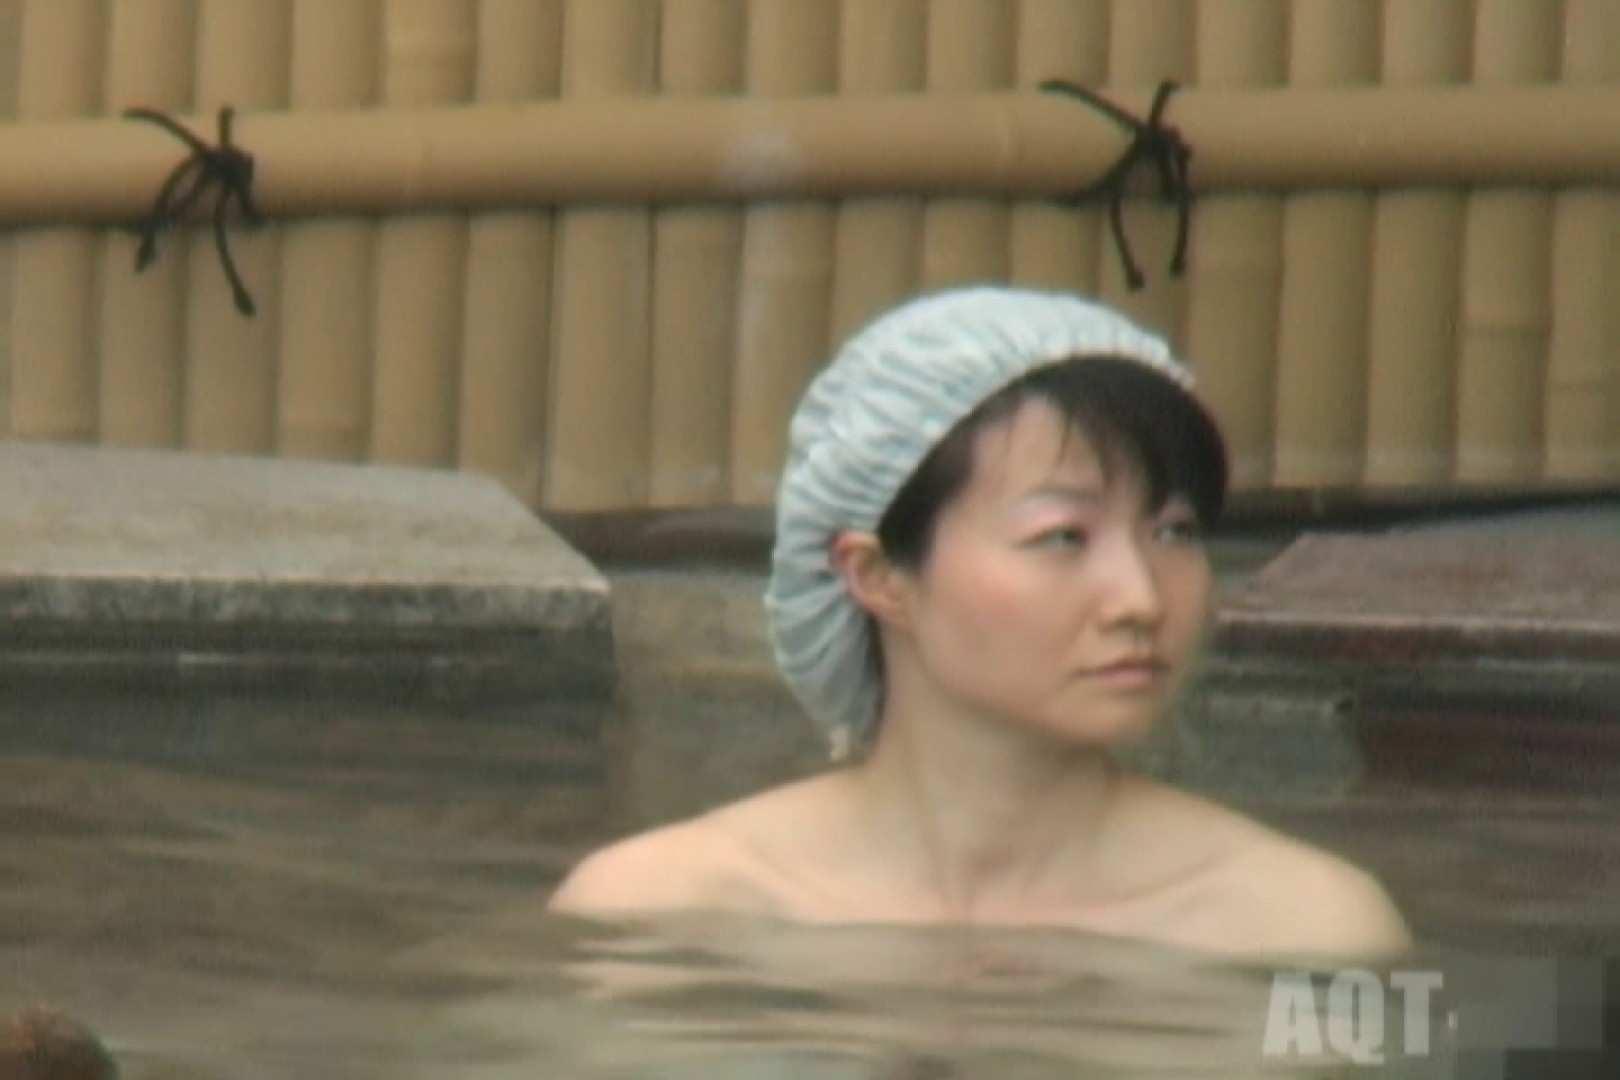 Aquaな露天風呂Vol.864 OLセックス  68画像 30